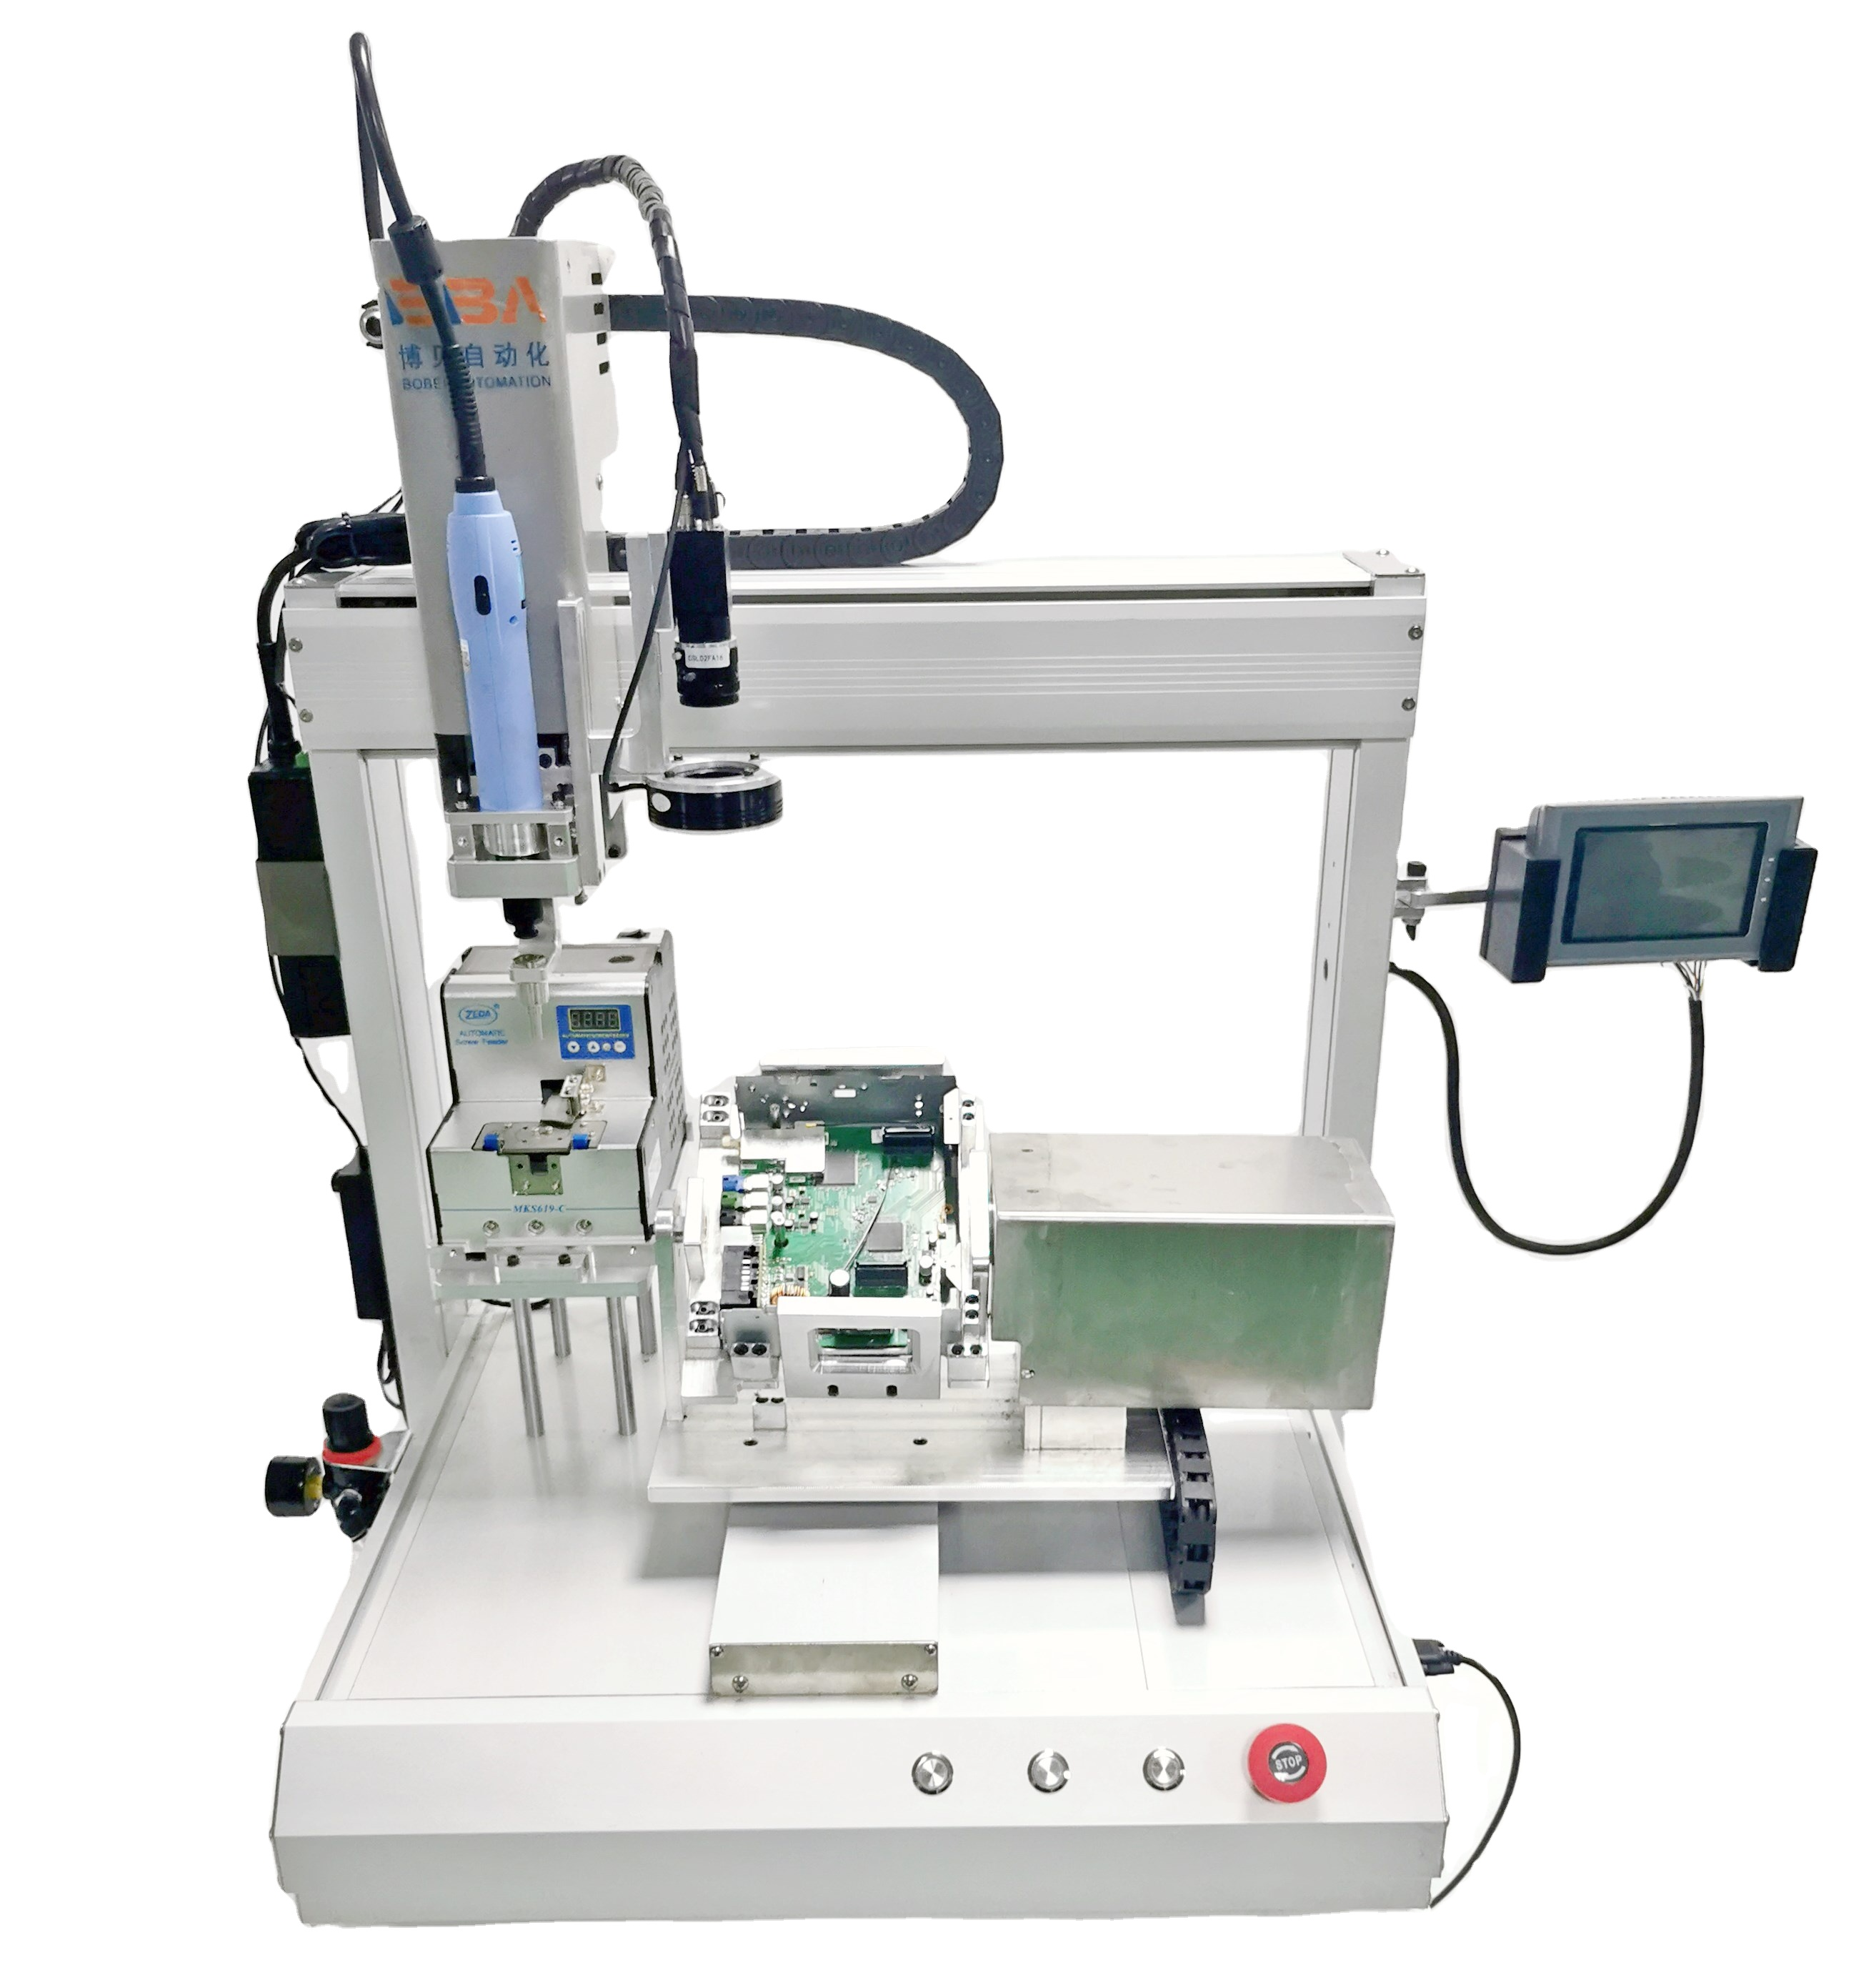 blowing type automatic locking screw machine